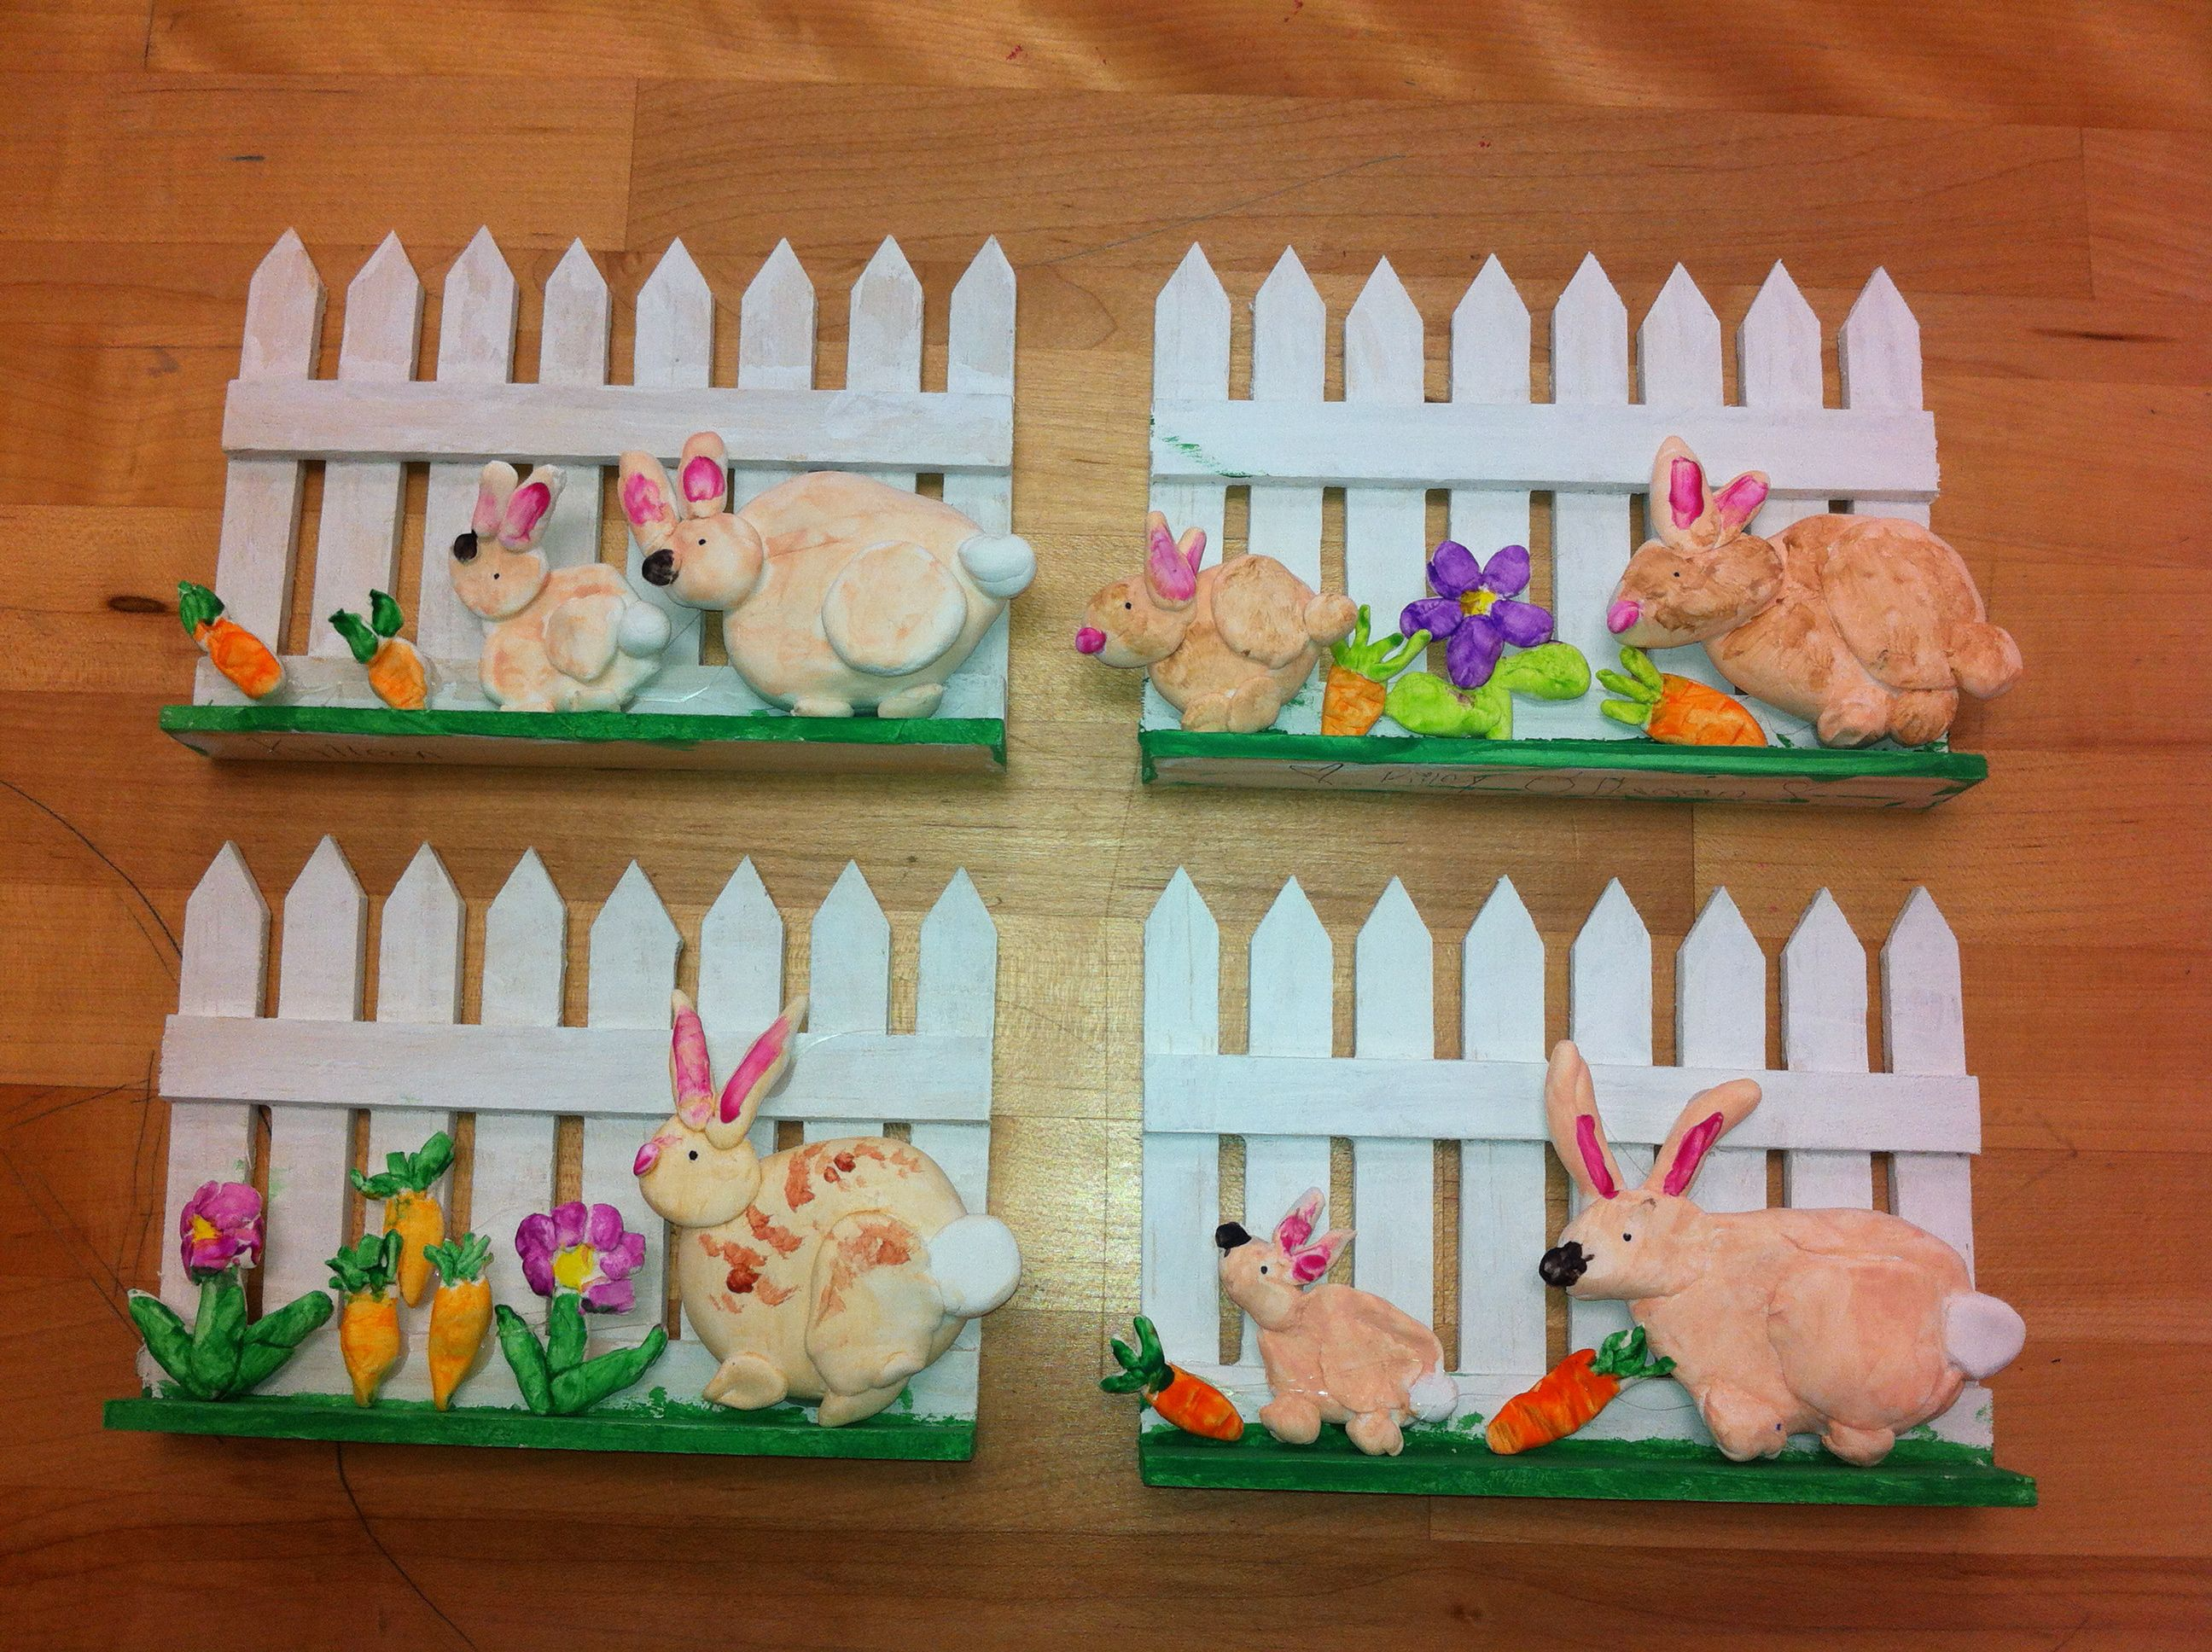 Clay Rabbits Wooden Fence Elementary Art Teacher V Giannetto